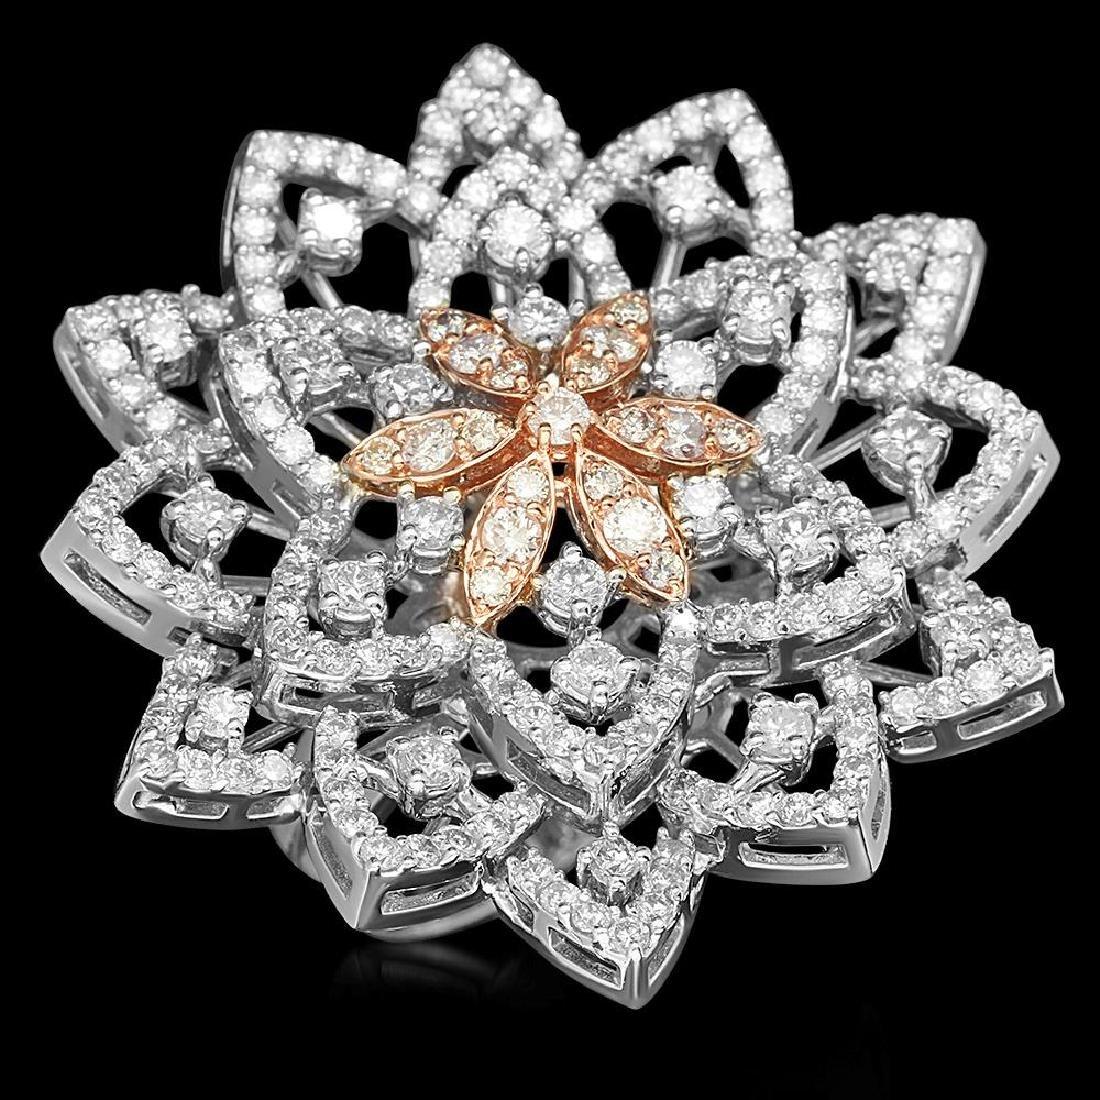 18K Gold 3.52ct Diamond Ring